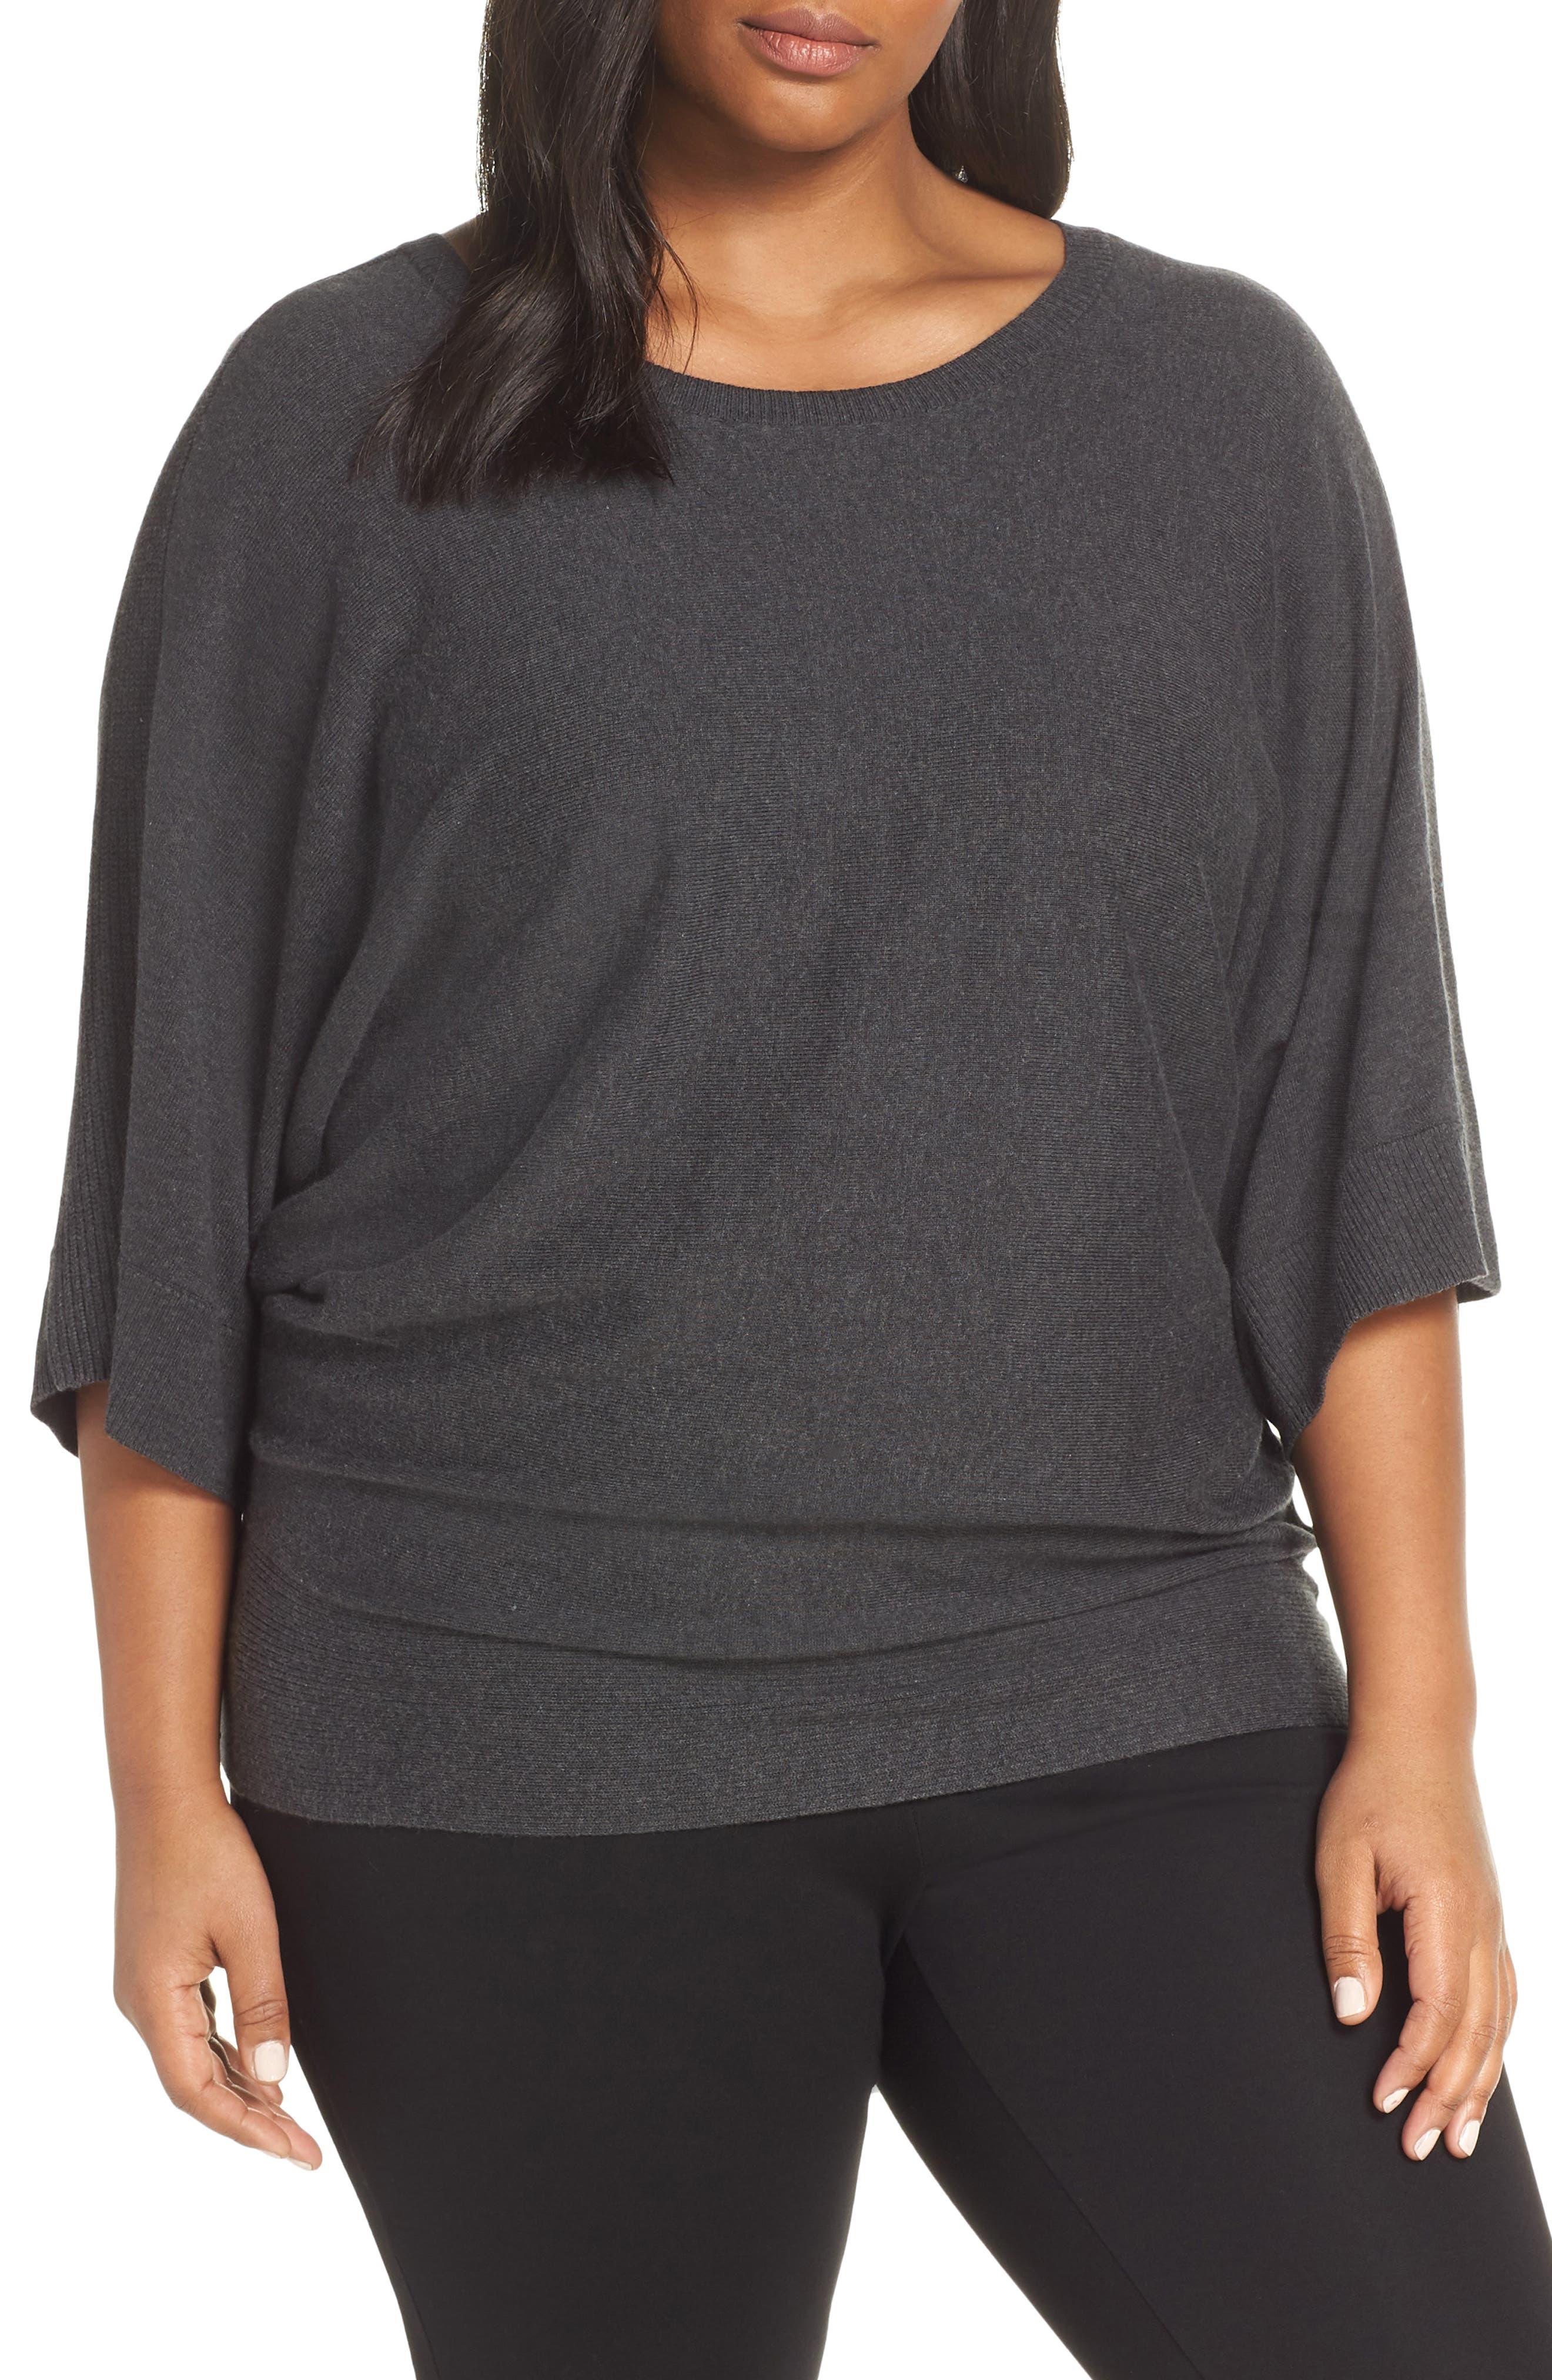 Cotton Blend Kimono Sweater,                             Main thumbnail 1, color,                             GREY DARK CHARCOAL HEATHER